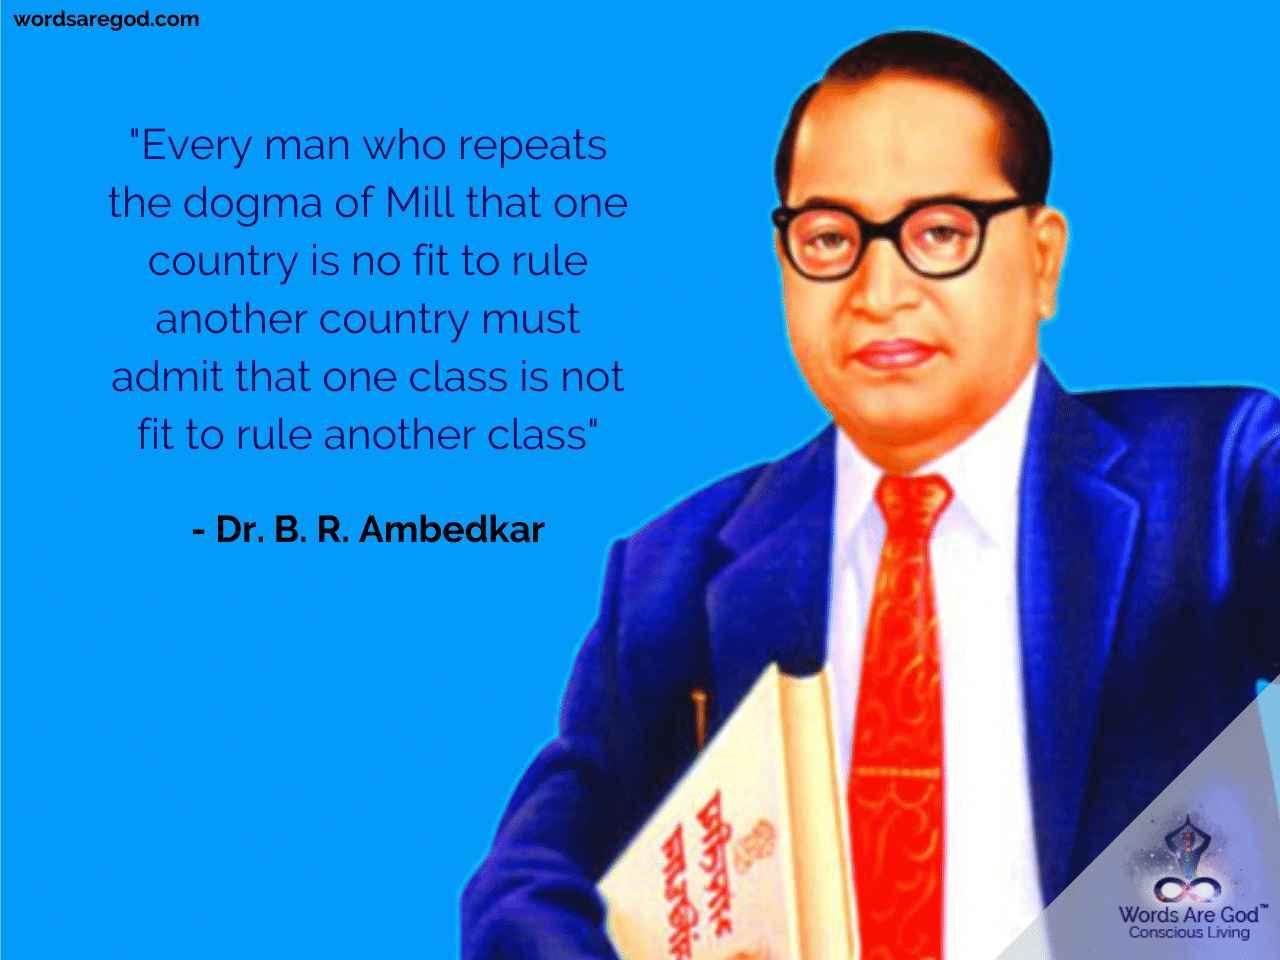 Dr. B. R. Ambedkar   Inspirational Quote by Dr. B. R. Ambedkar